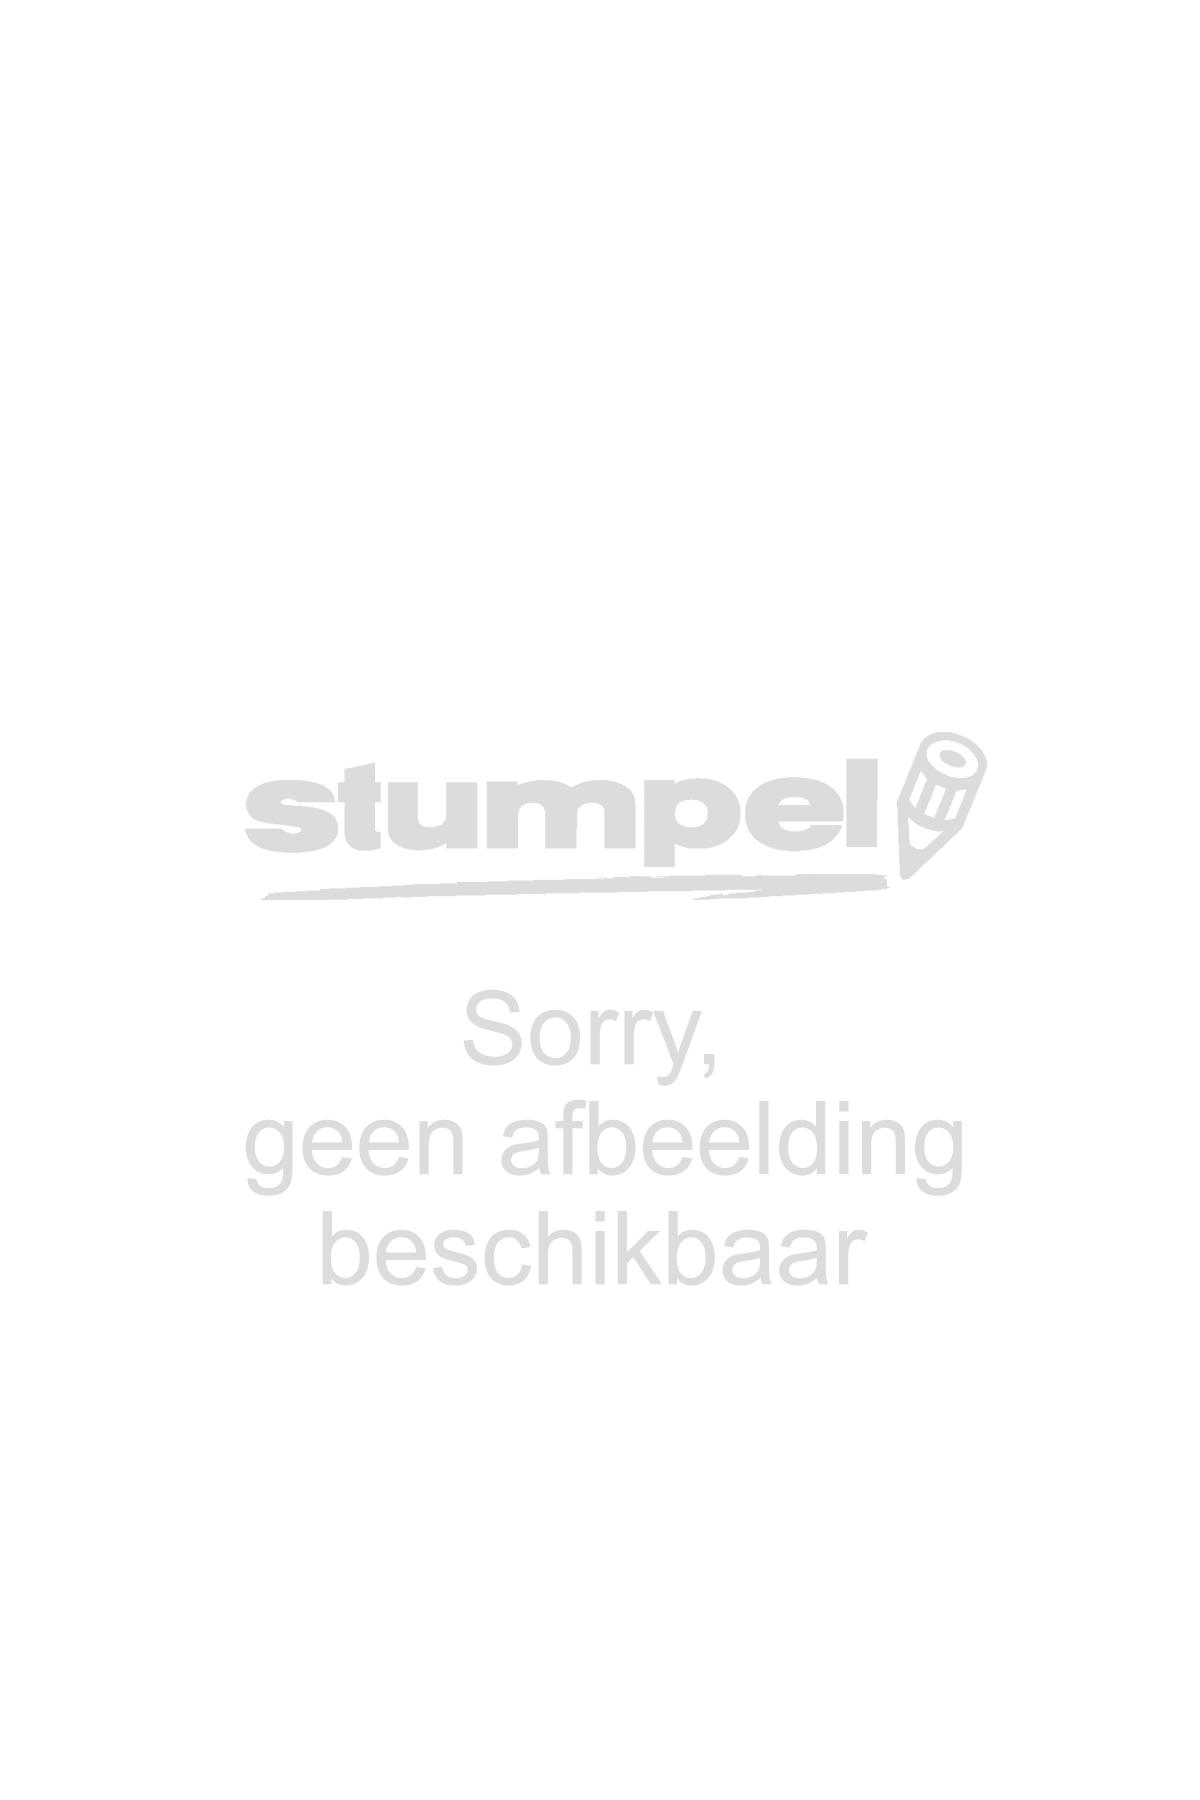 paraplu-minimax-opvouwbaar-bordeaux-impliva-10806575